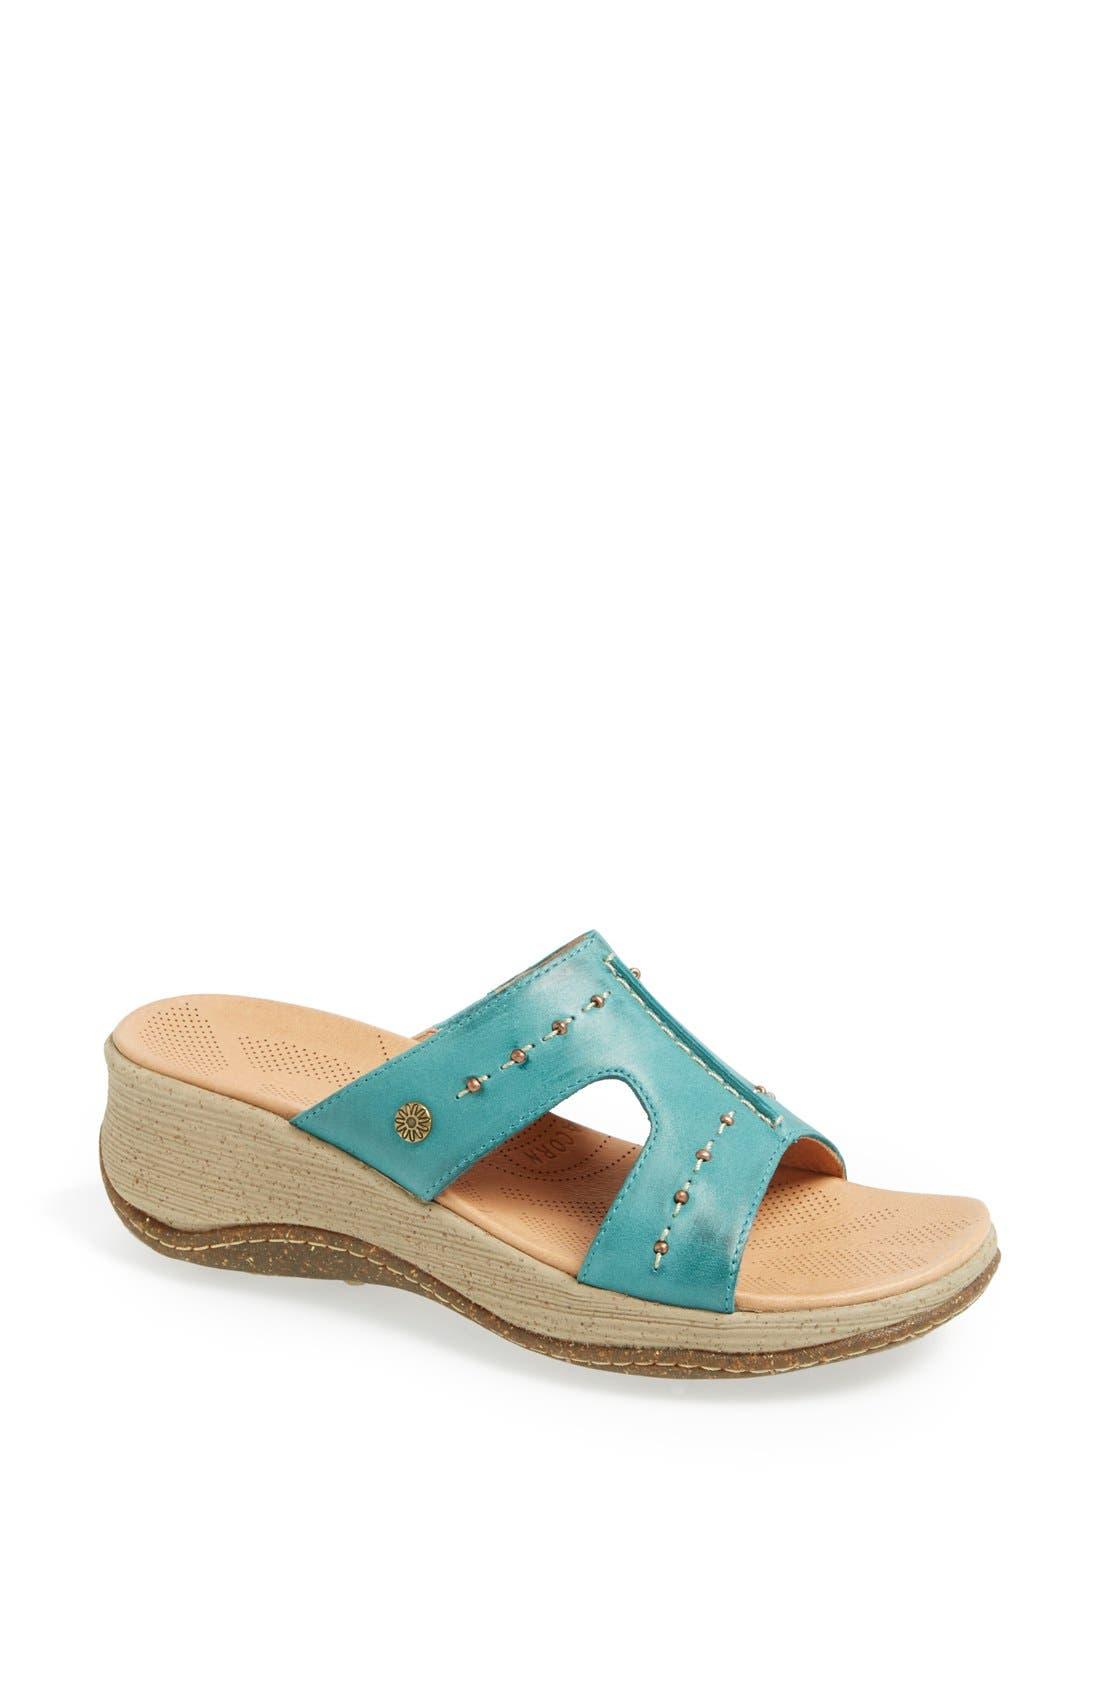 Main Image - Acorn 'Vista' Wedge Sandal